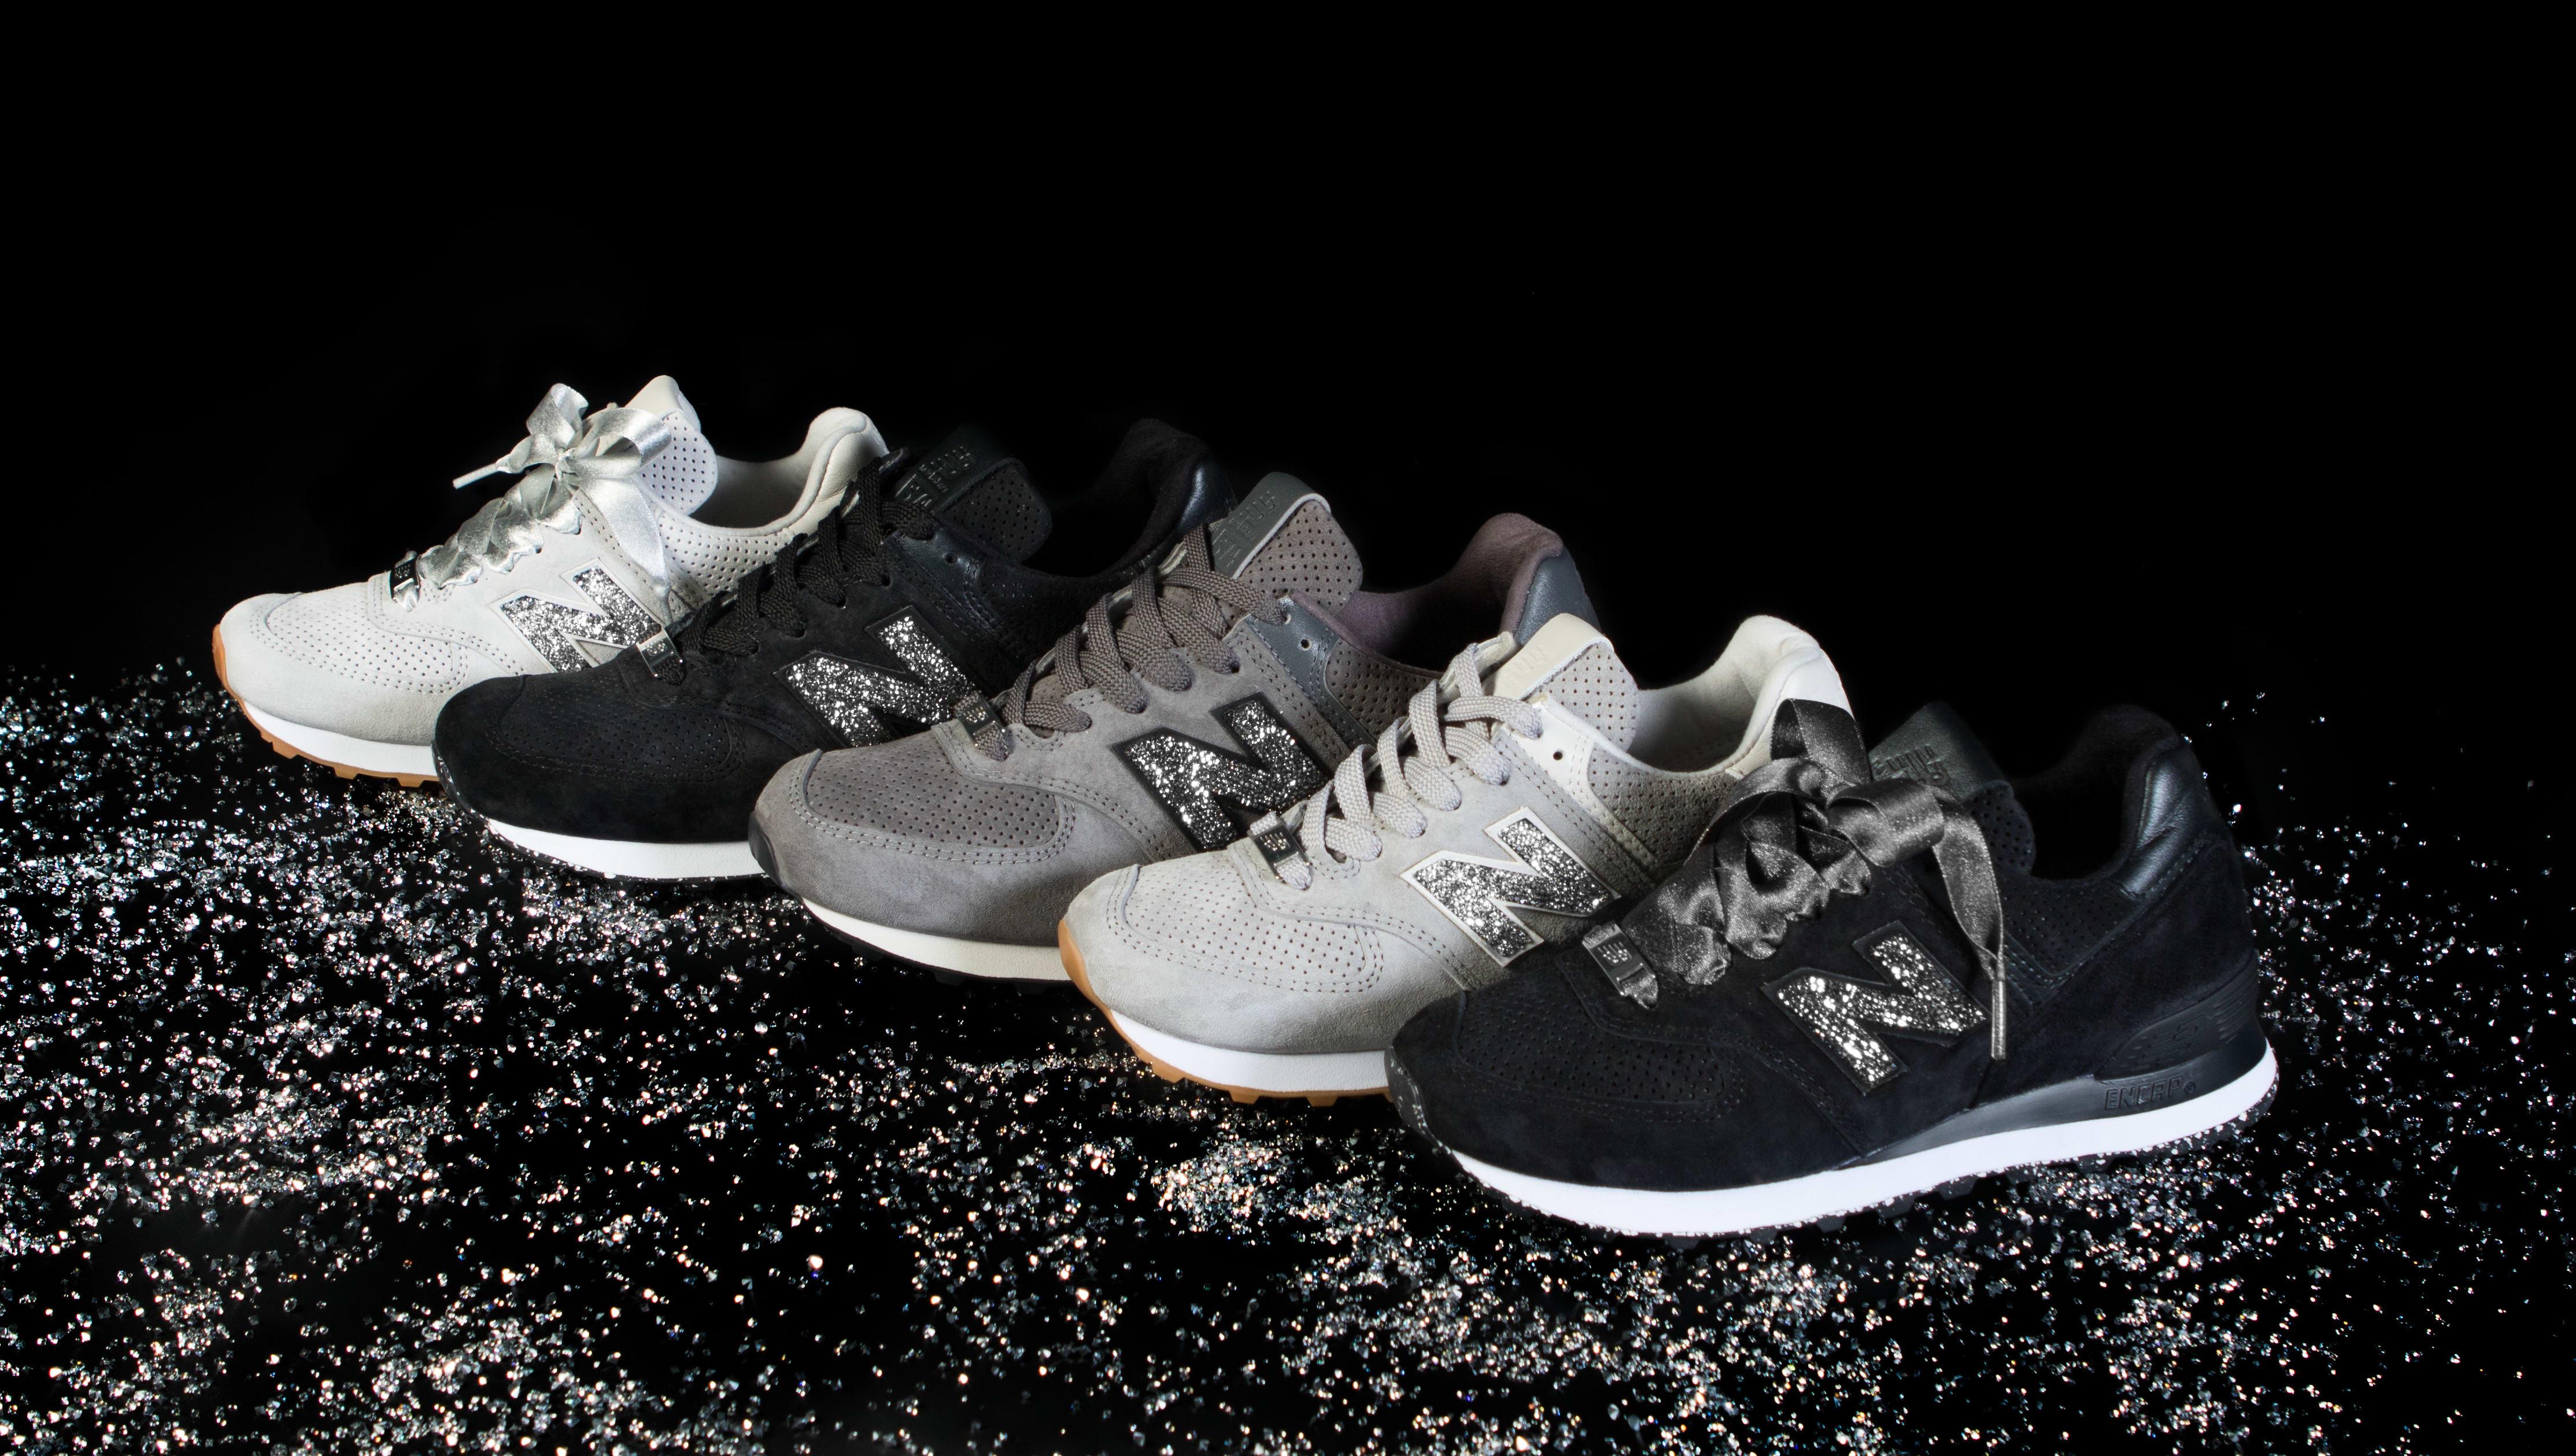 on sale b5ba6 83fc6 norway shoes like new balance 574 a7616 84eb1